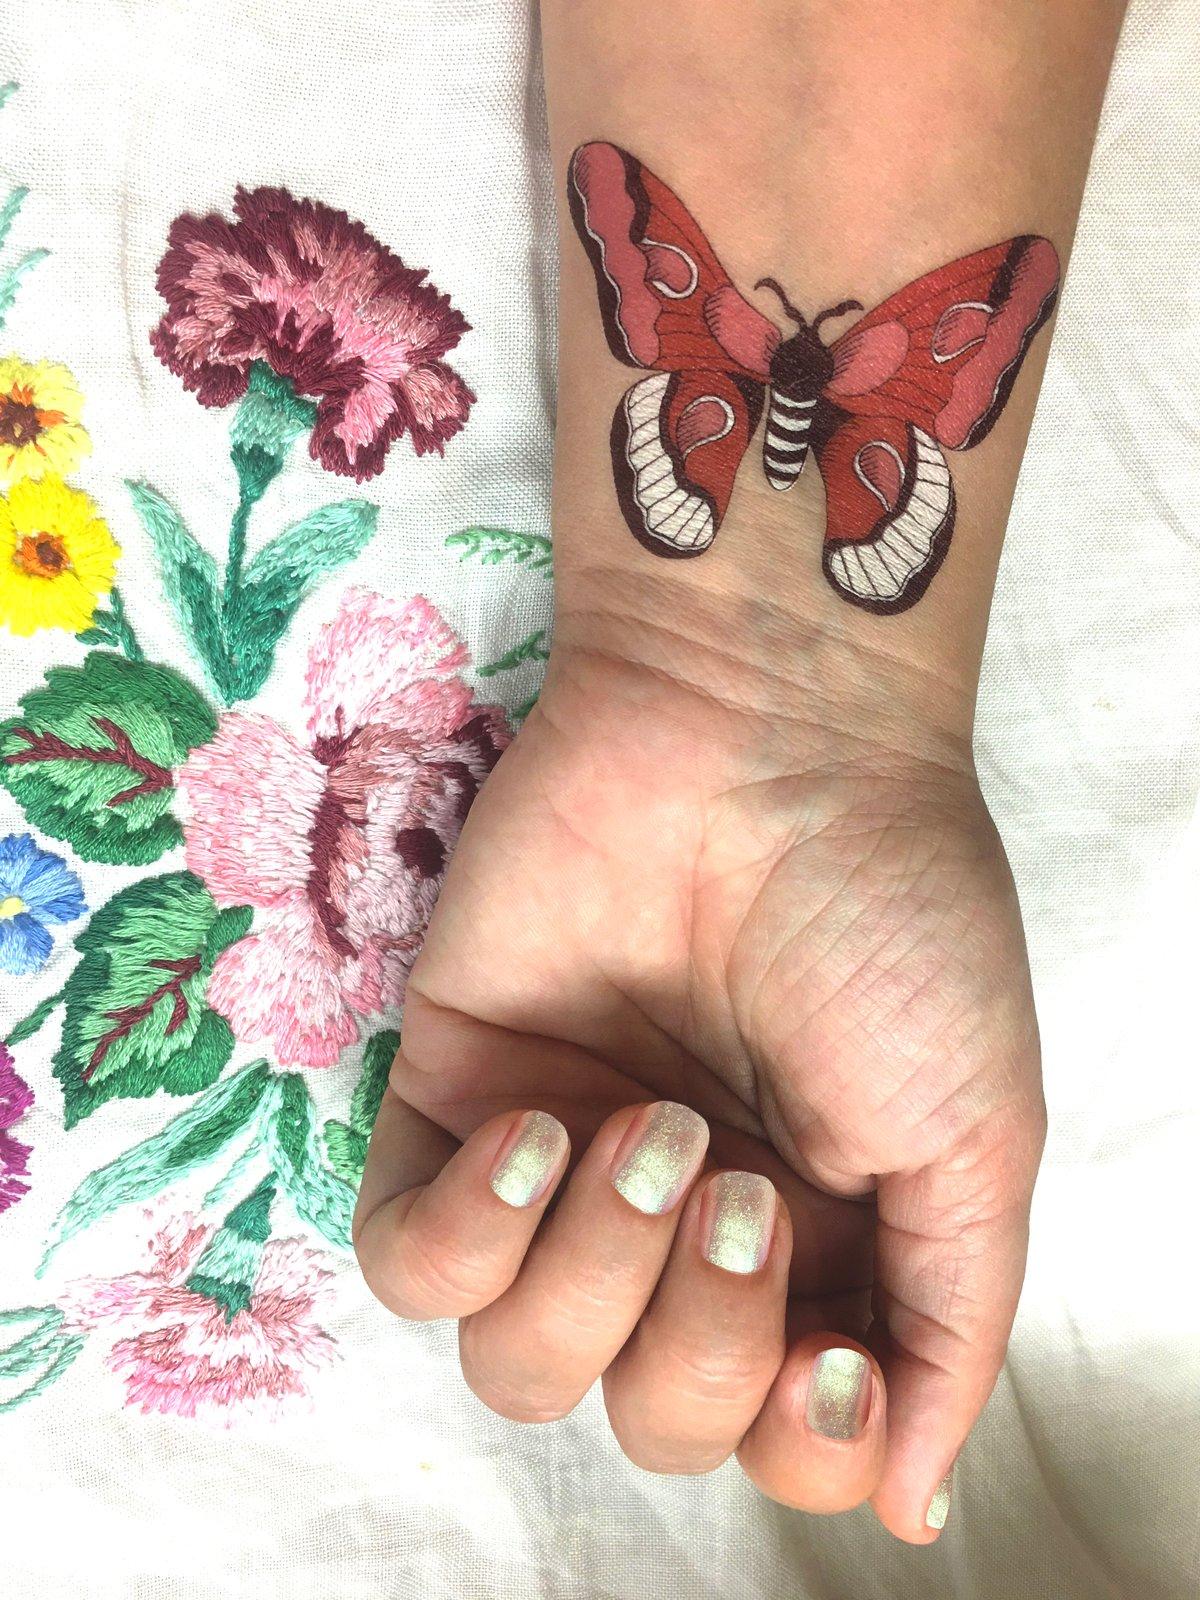 **NEW** A5 Flora and Fauna Temporary Tattoos